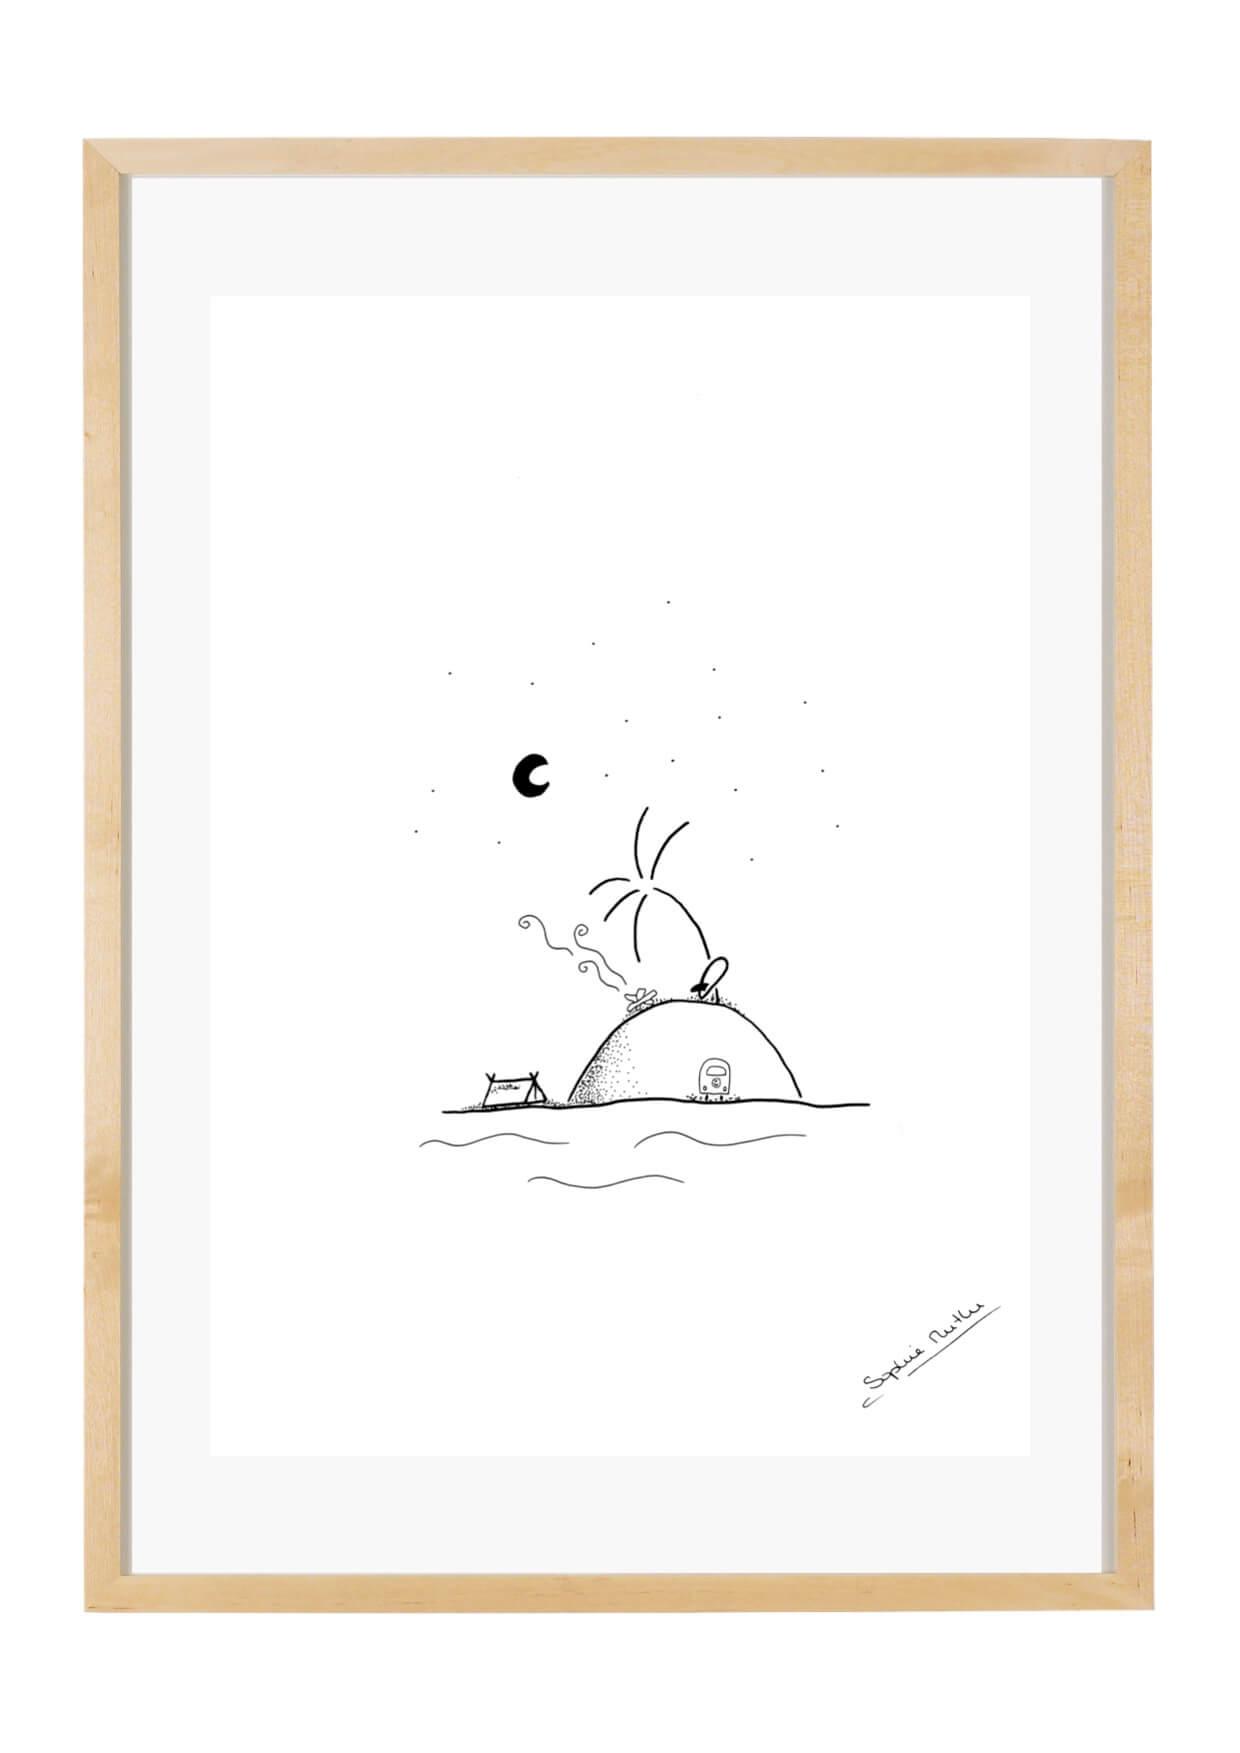 Surfer's Island